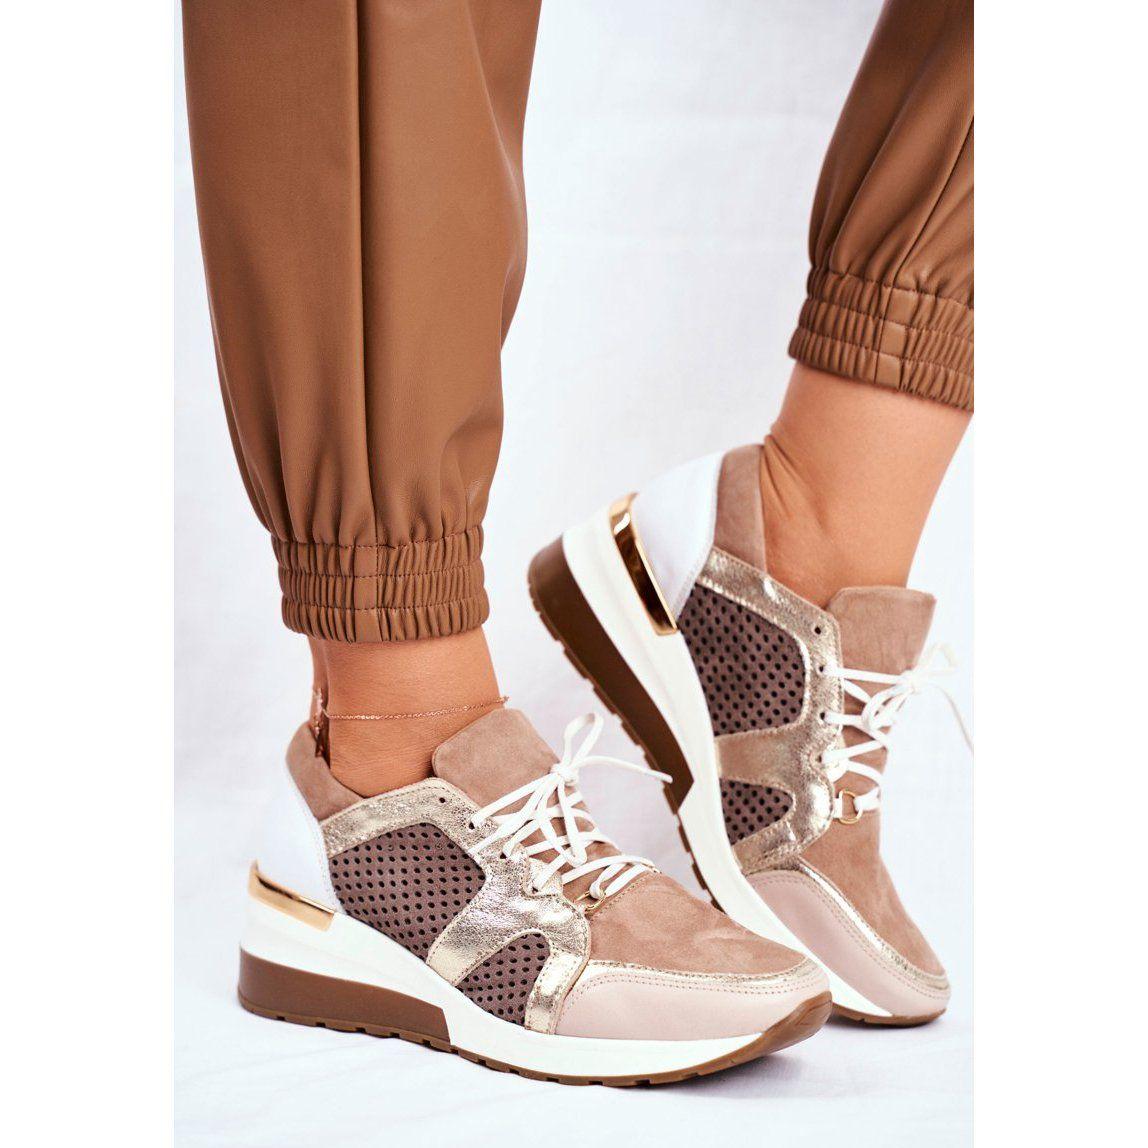 Sportowe Damskie Buty Skorzane Sneakersy Nicole Bezowe 2562 Daina Bezowy Sneakers Wedge Sneaker Shoes